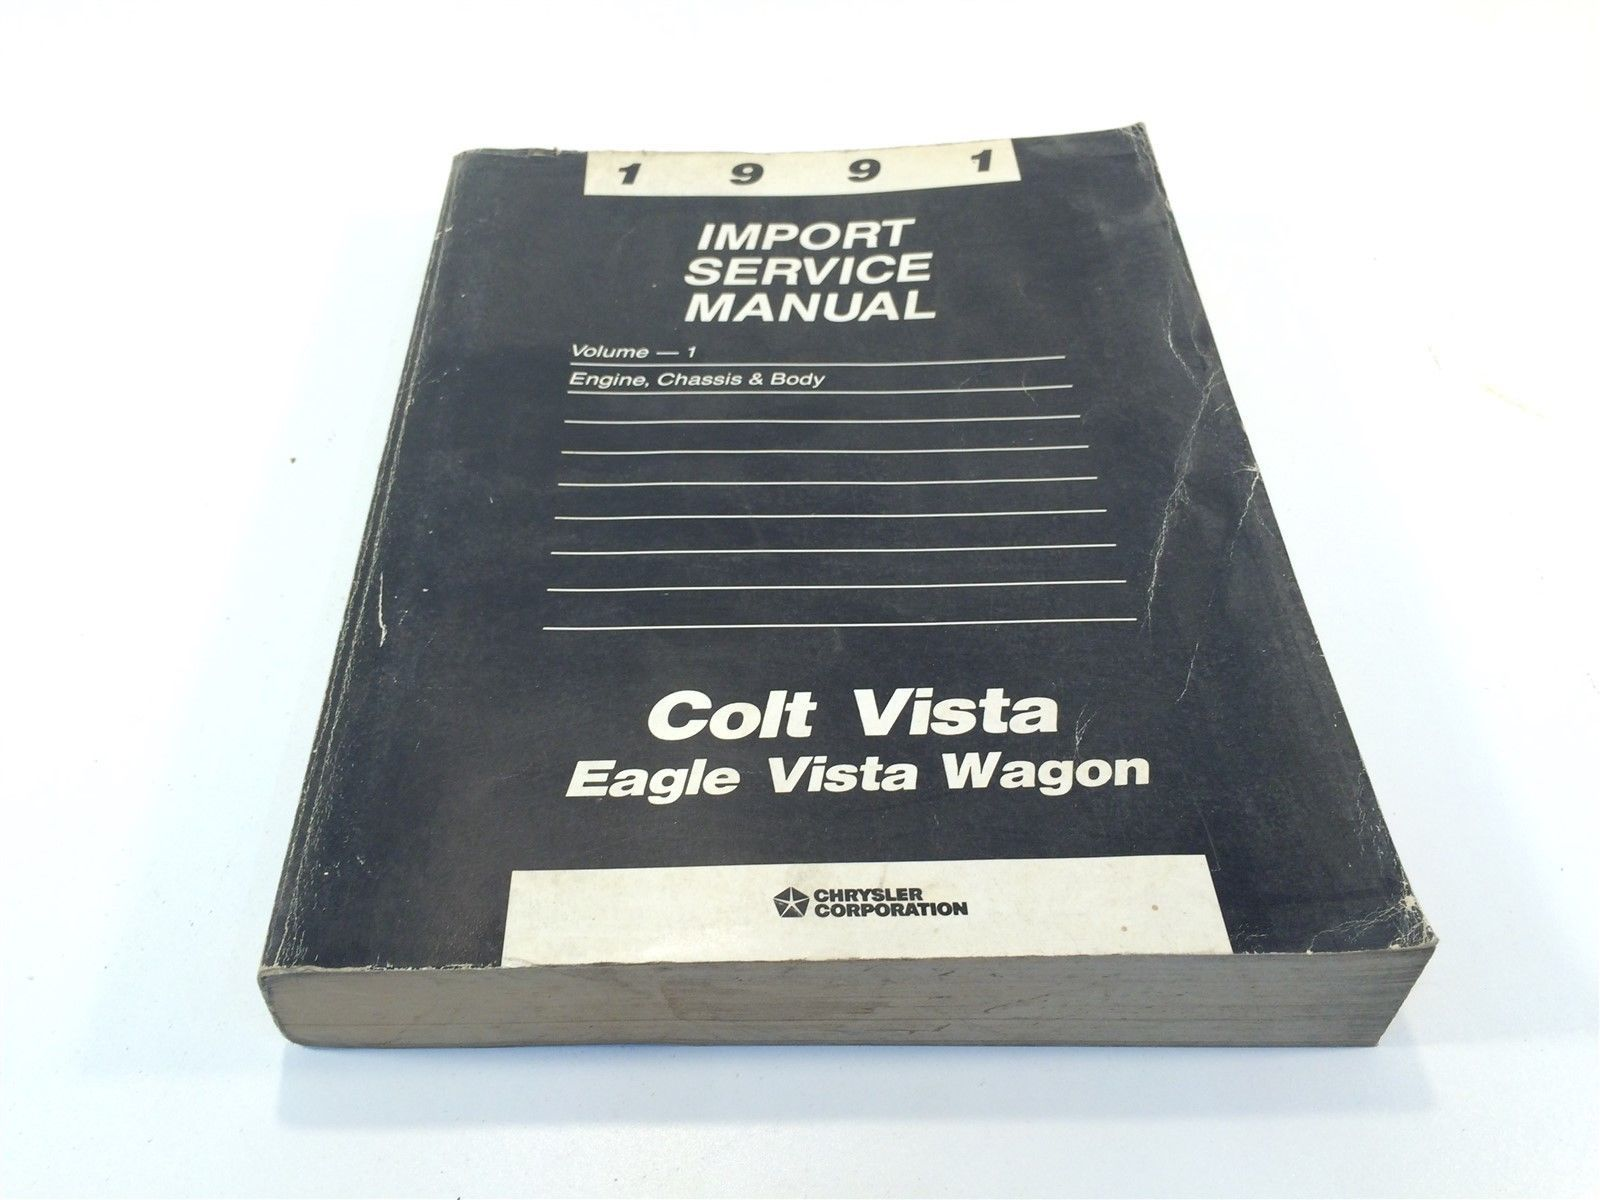 1991 Chrysler Import Service Manual Volume-1 Engine Chassis & Body Colt Vista - $14.99